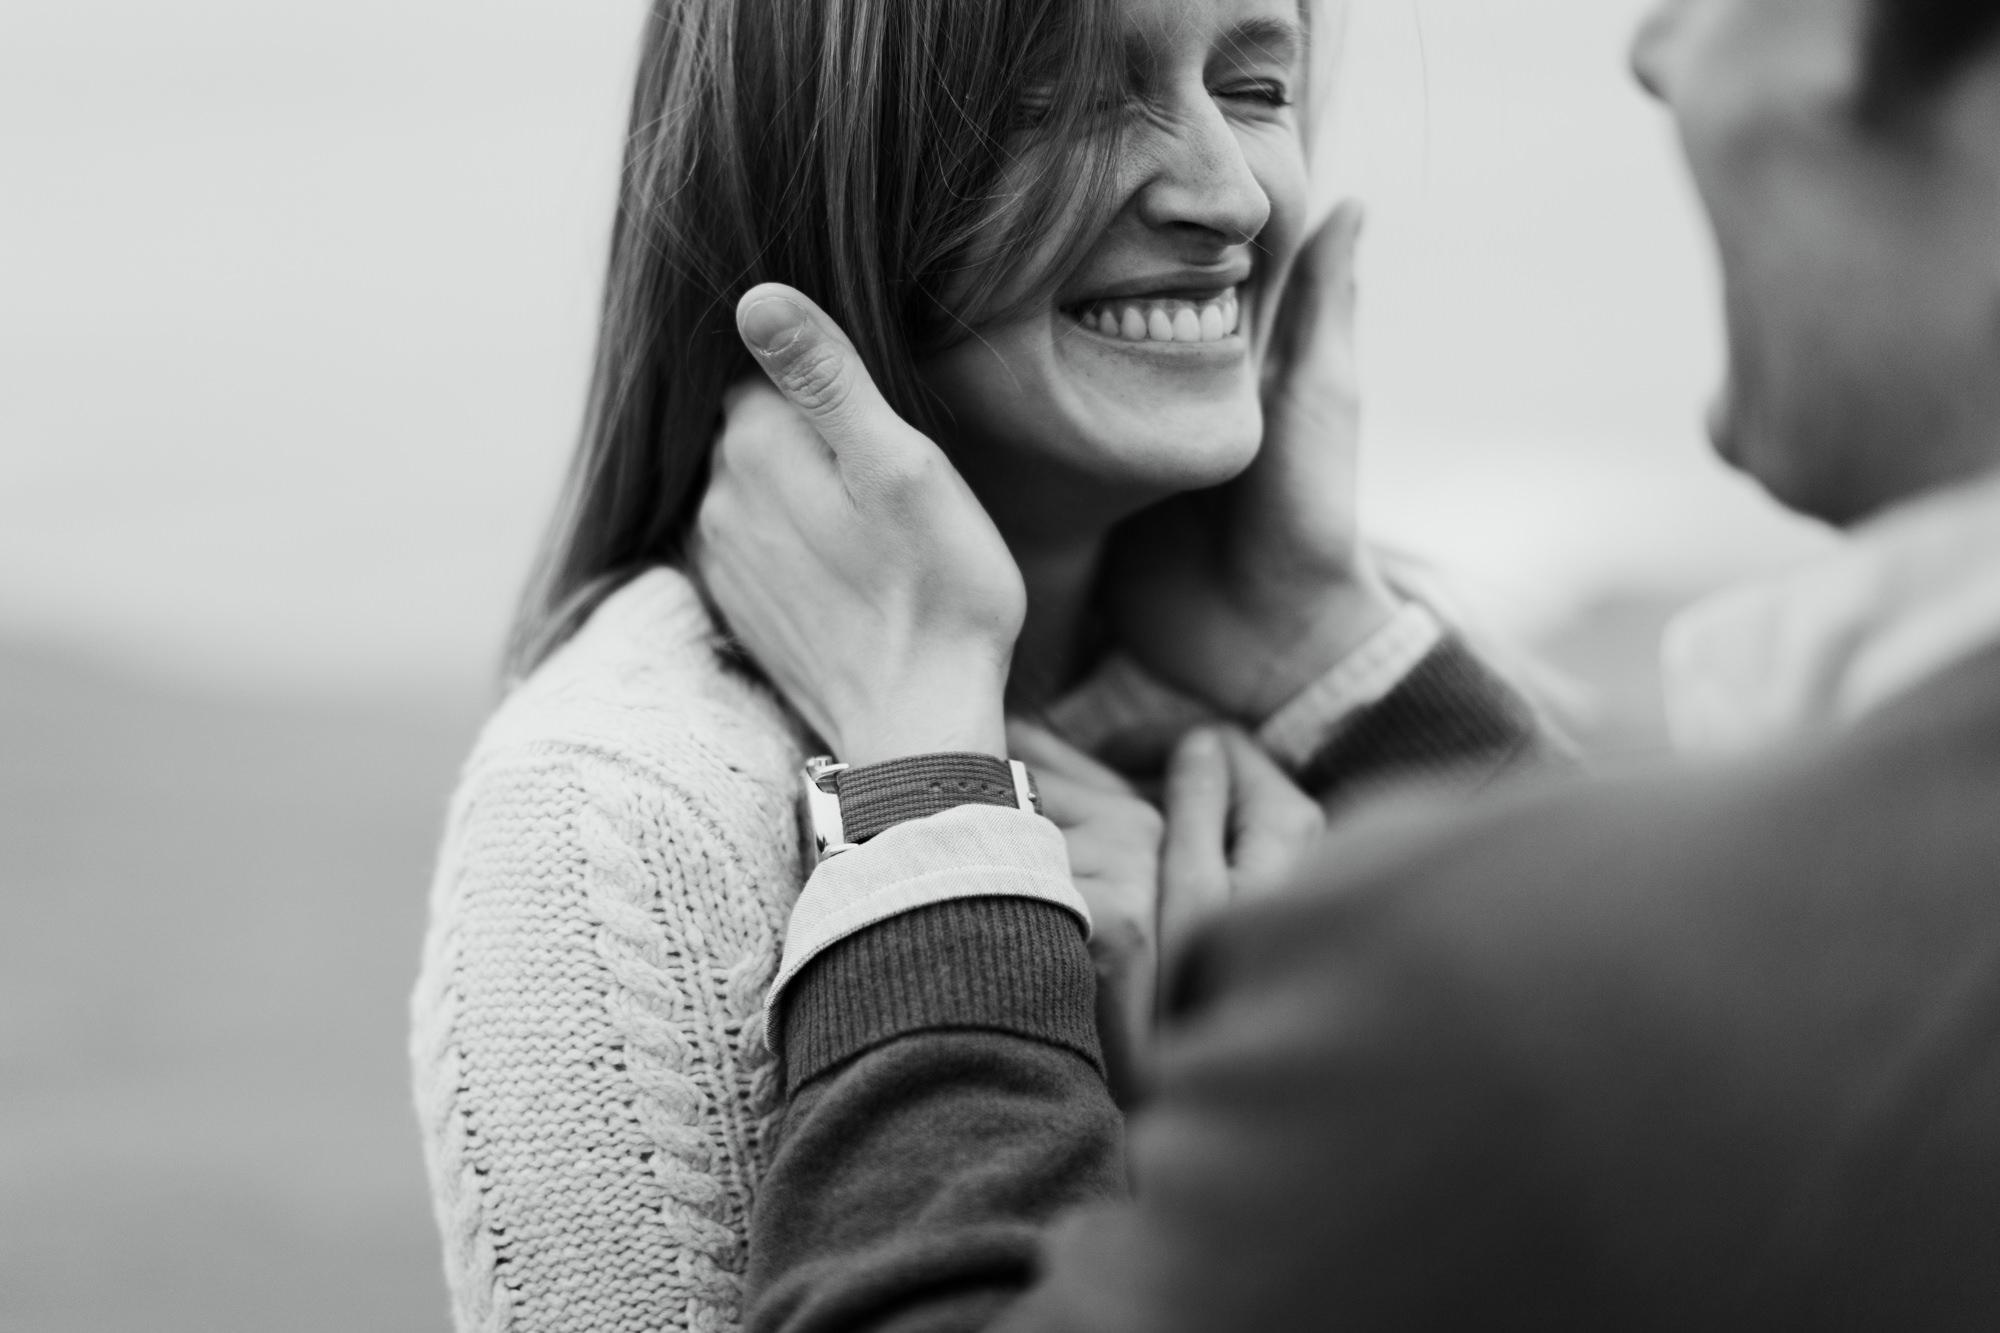 adventurous engagement photo session at point reyes national seashore // california wedding photographer // www.abbihearne.com